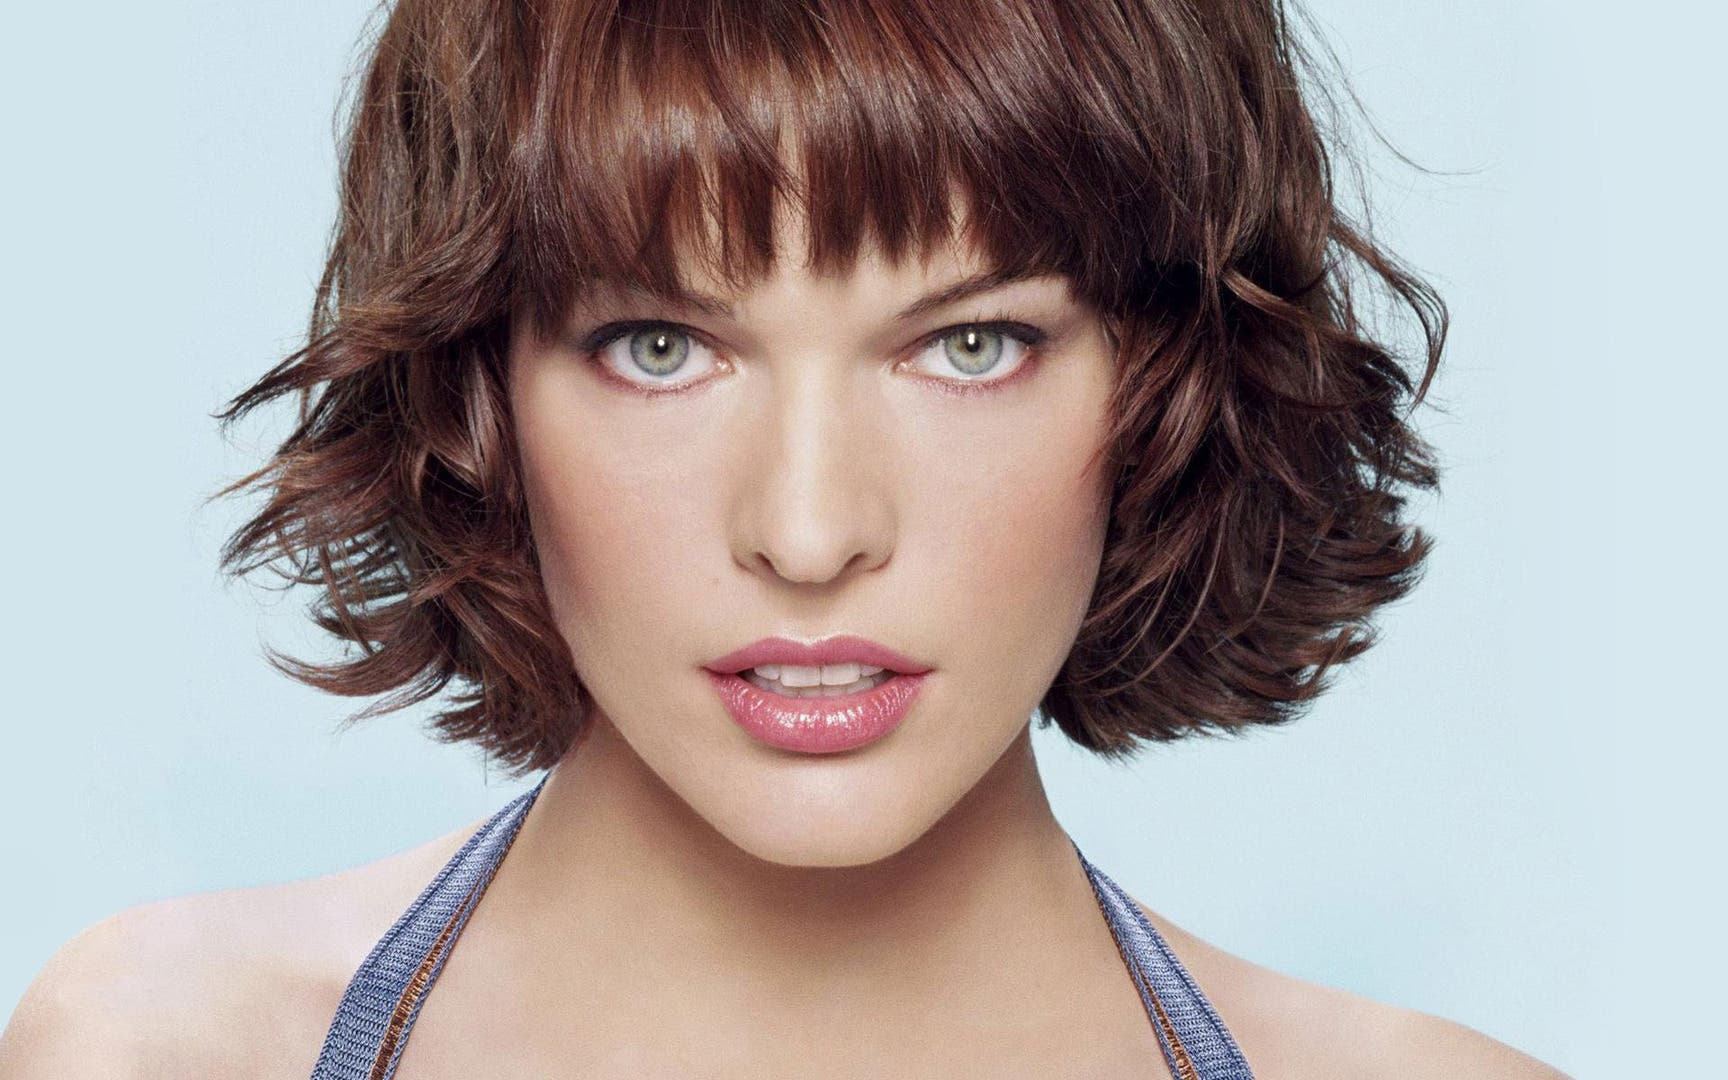 Milla Jovovich On Board For Cymbeline With Ethan Hawke